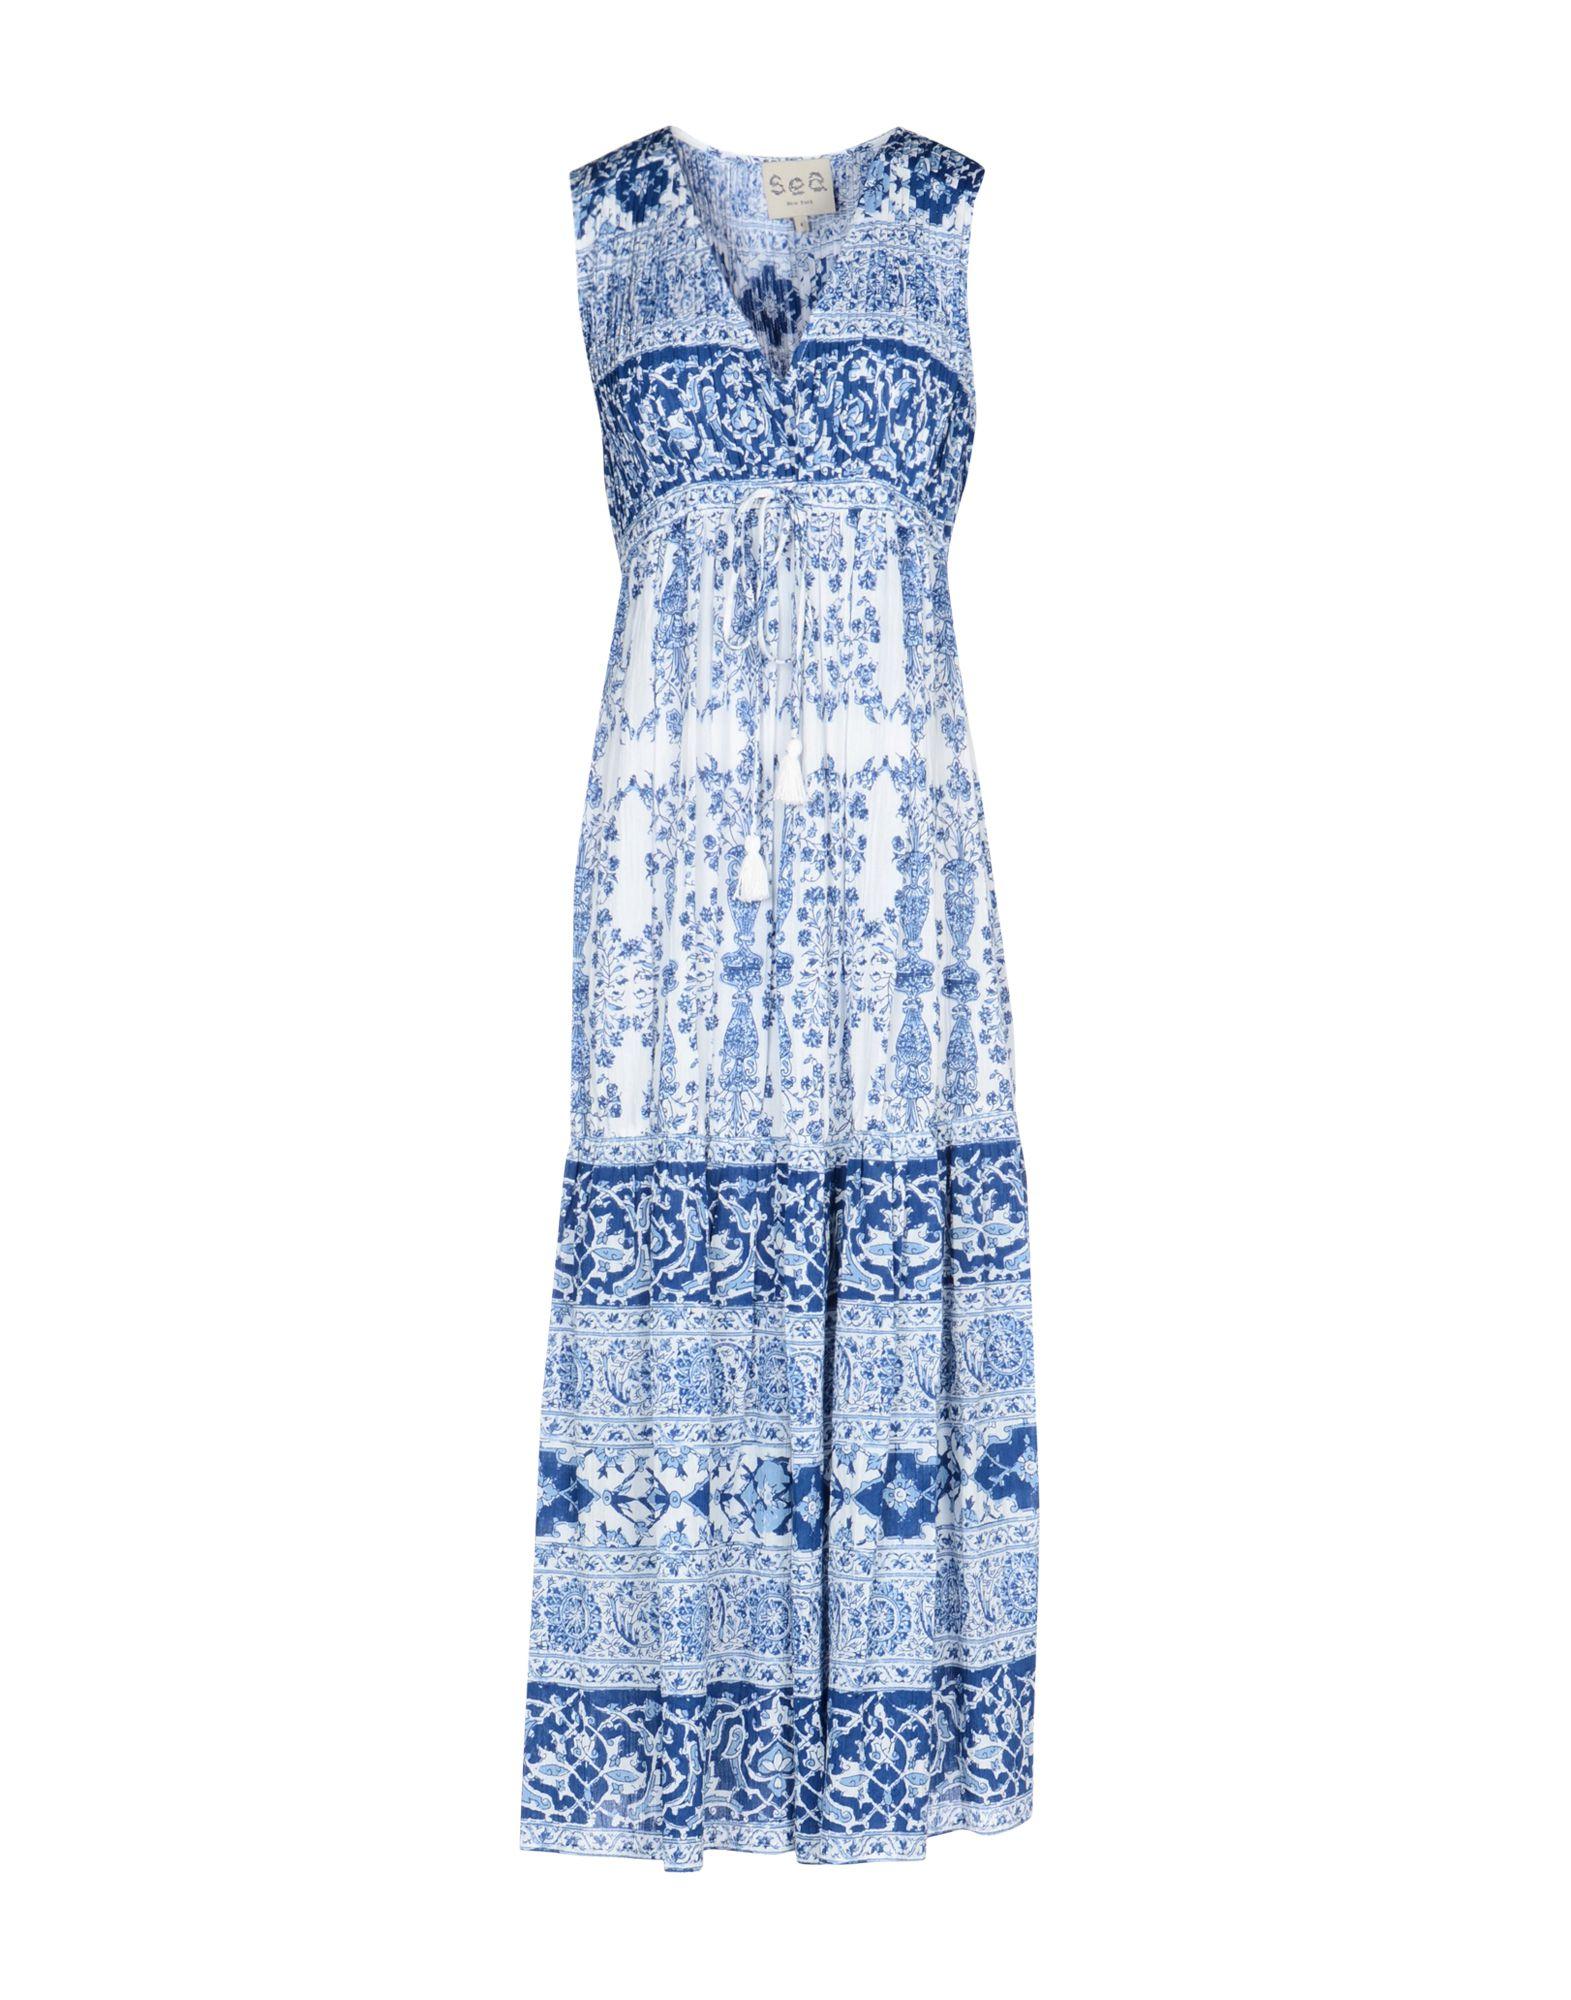 SEA Платье длиной 3/4 lisa corti платье длиной 3 4